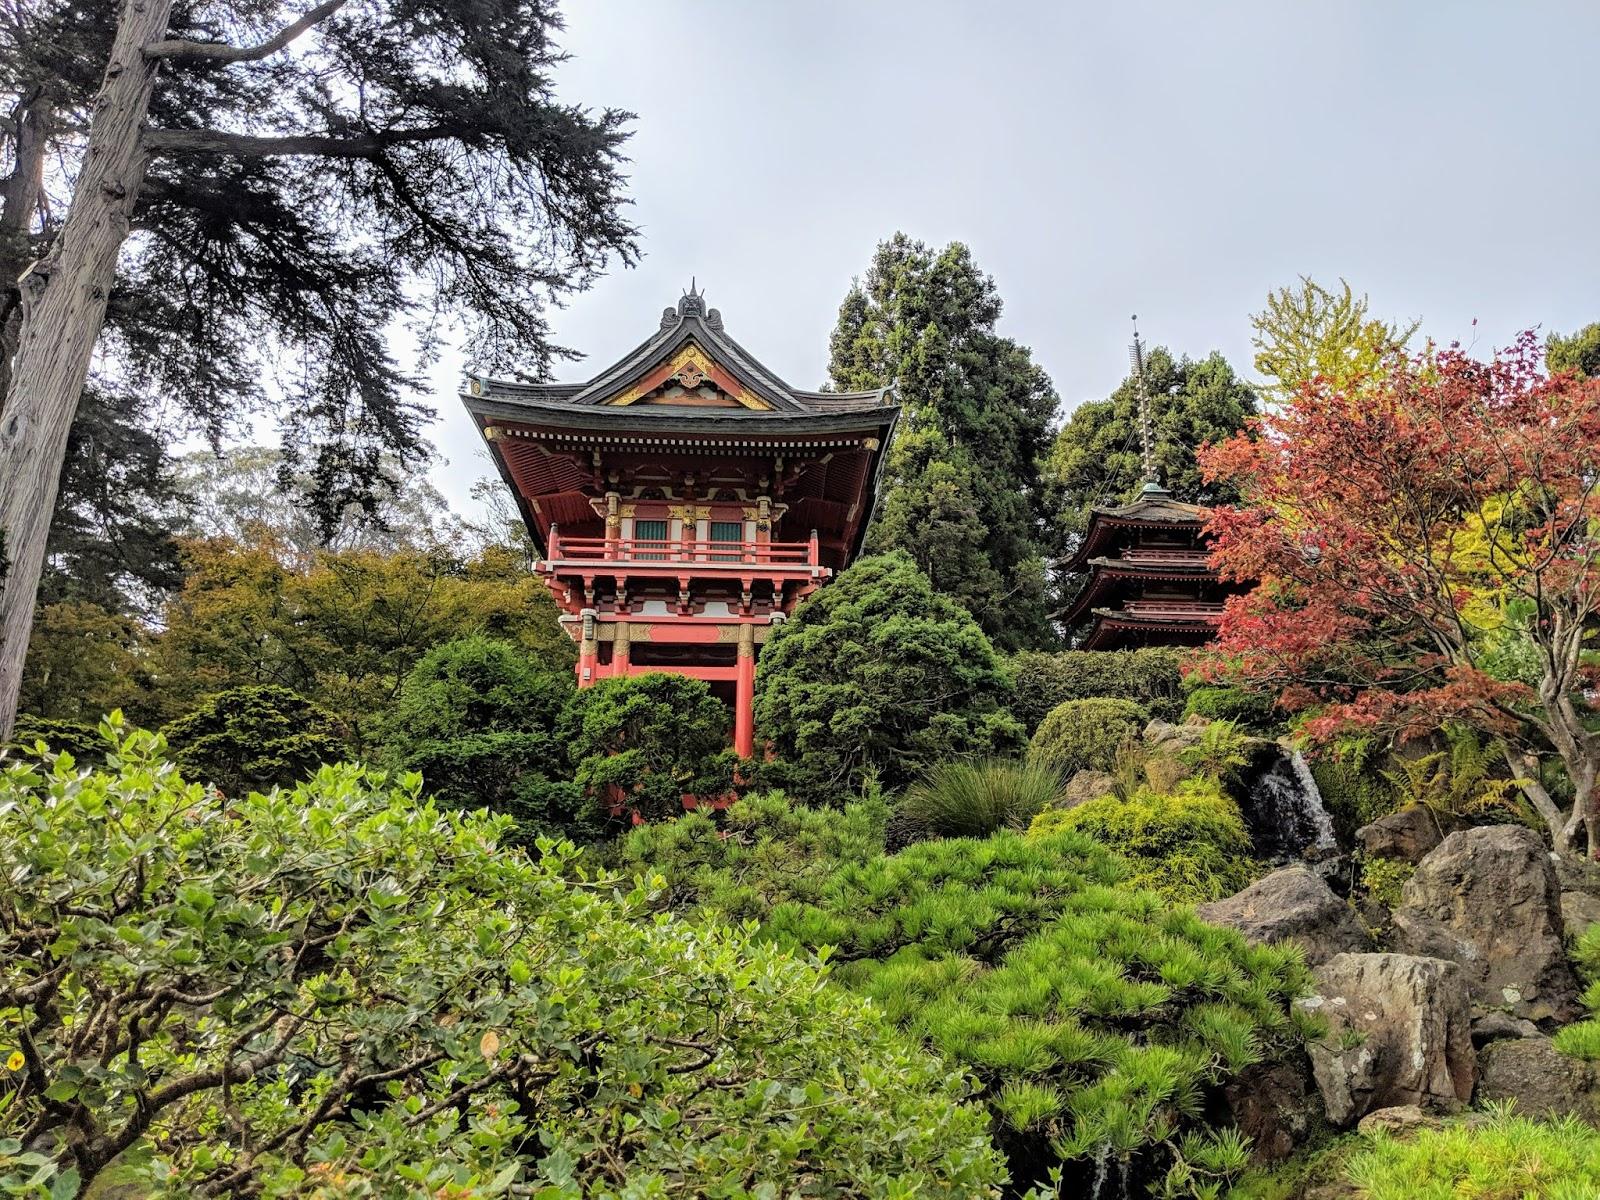 Enjoy Afternoon Tea At The Japanese Tea Garden In San Francisco